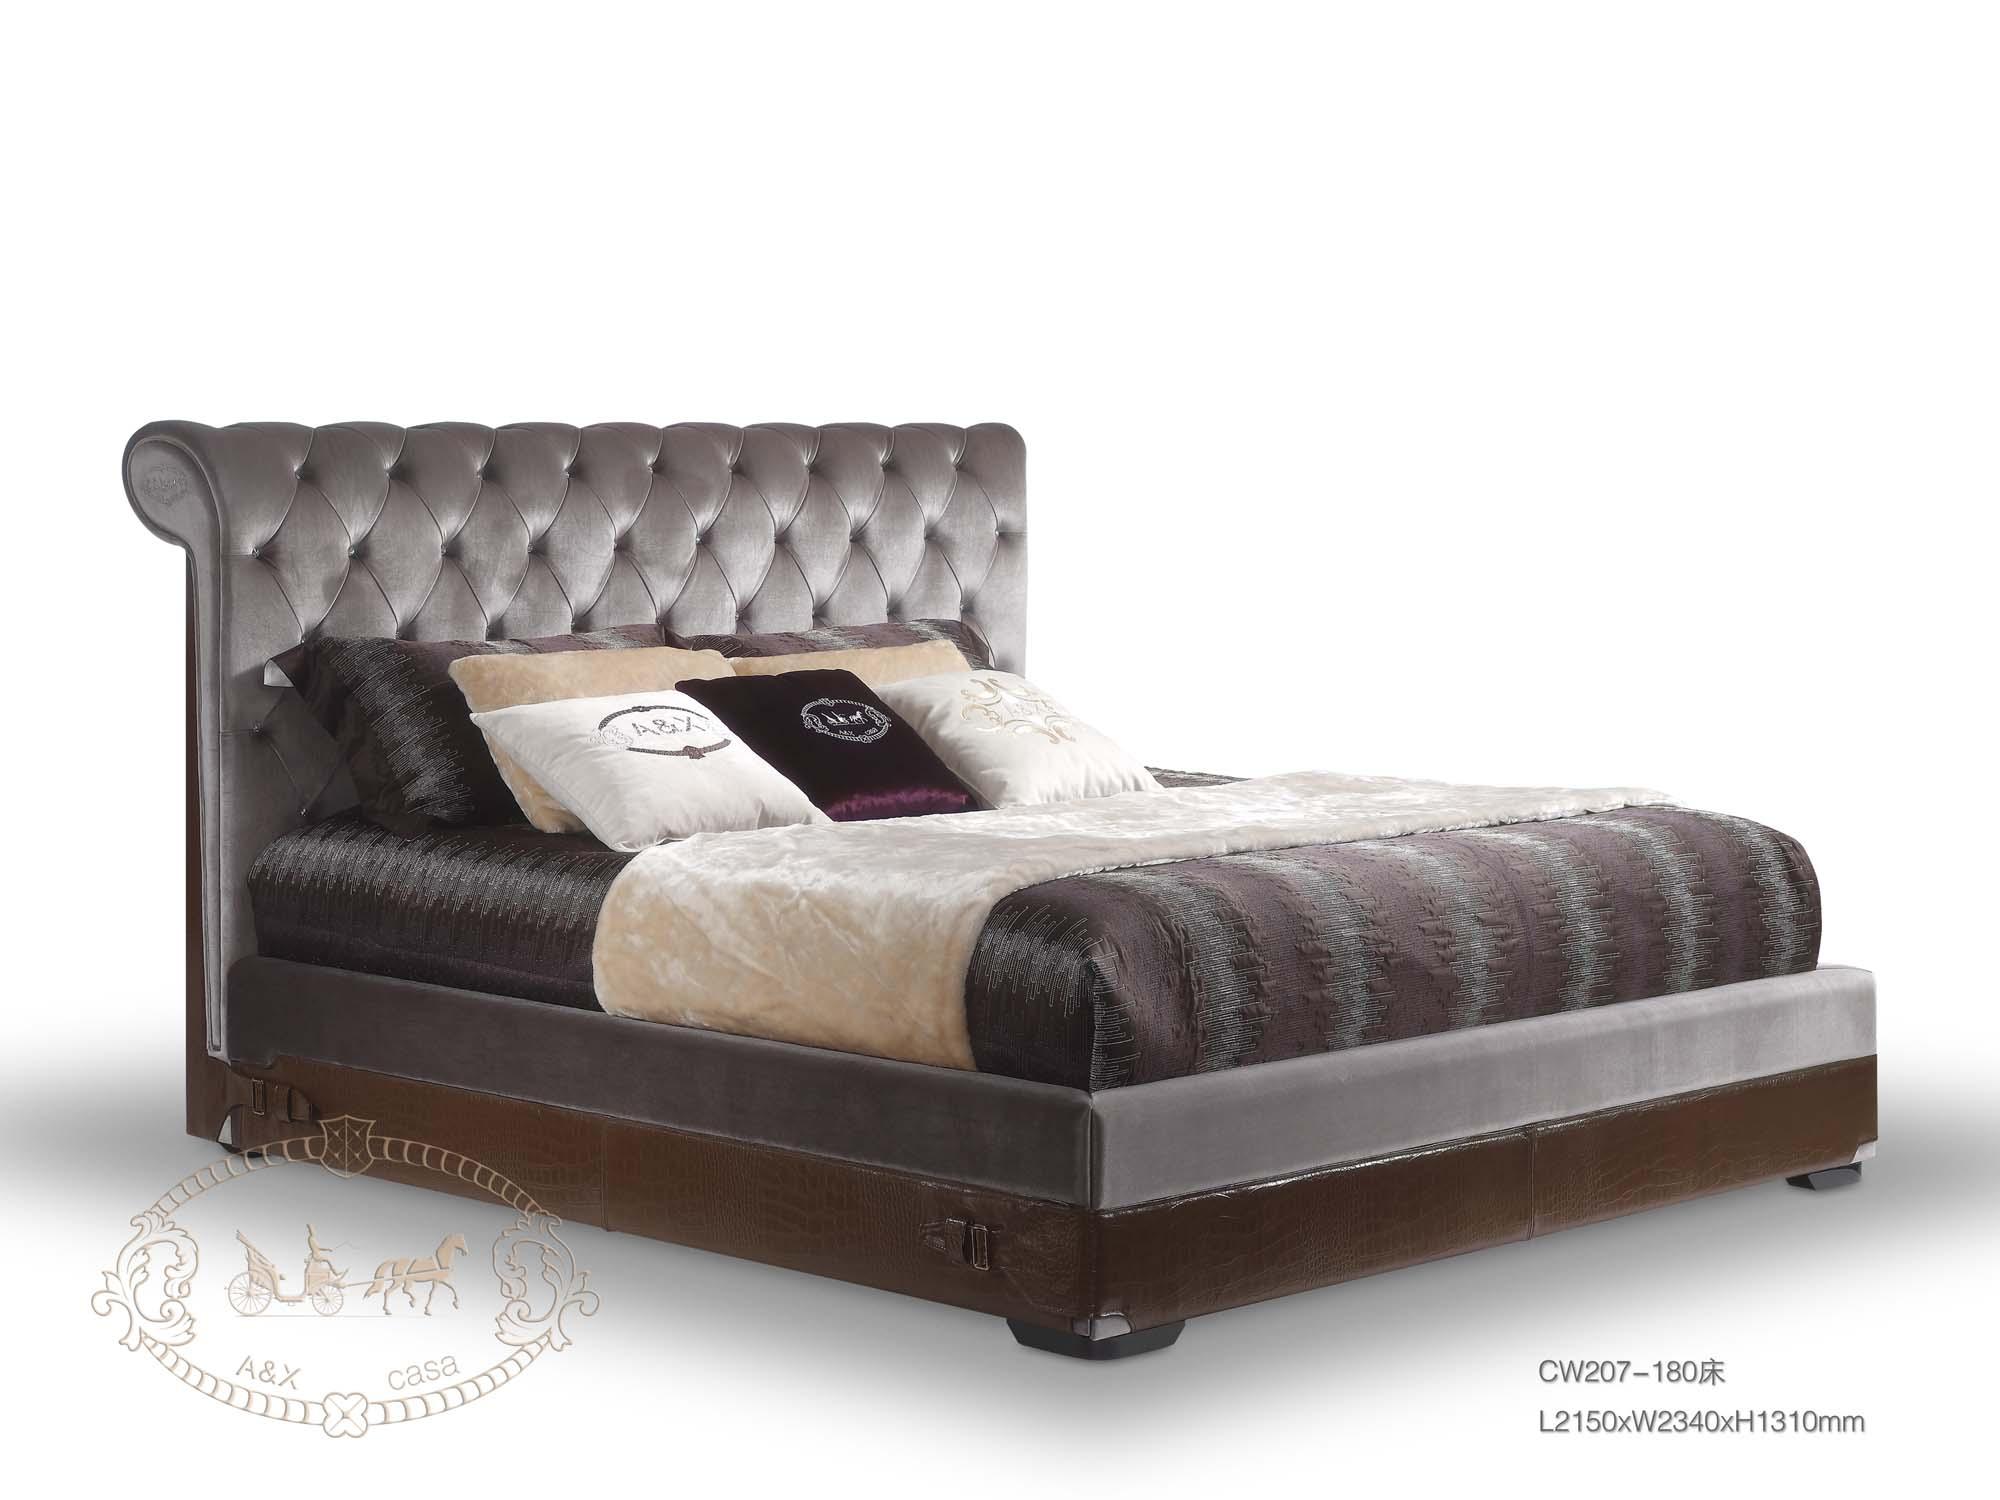 China Furniture Bedroom Luxury, China Furniture Bedroom Luxury ...